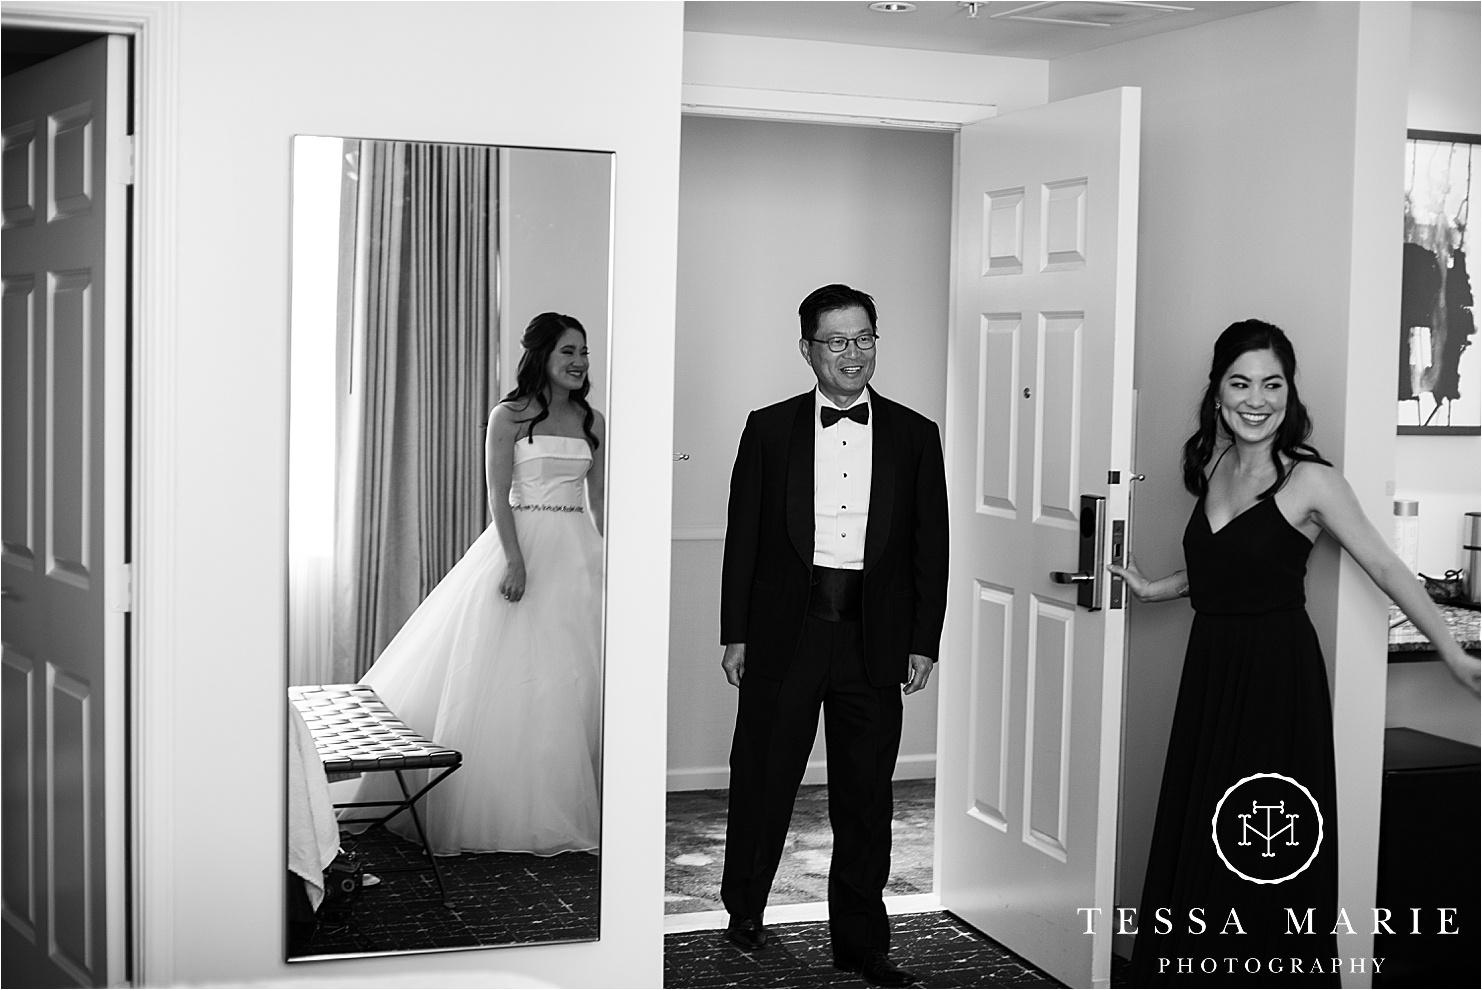 Tessa_marie_weddings_houston_wedding_photographer_The_astorian_0022.jpg